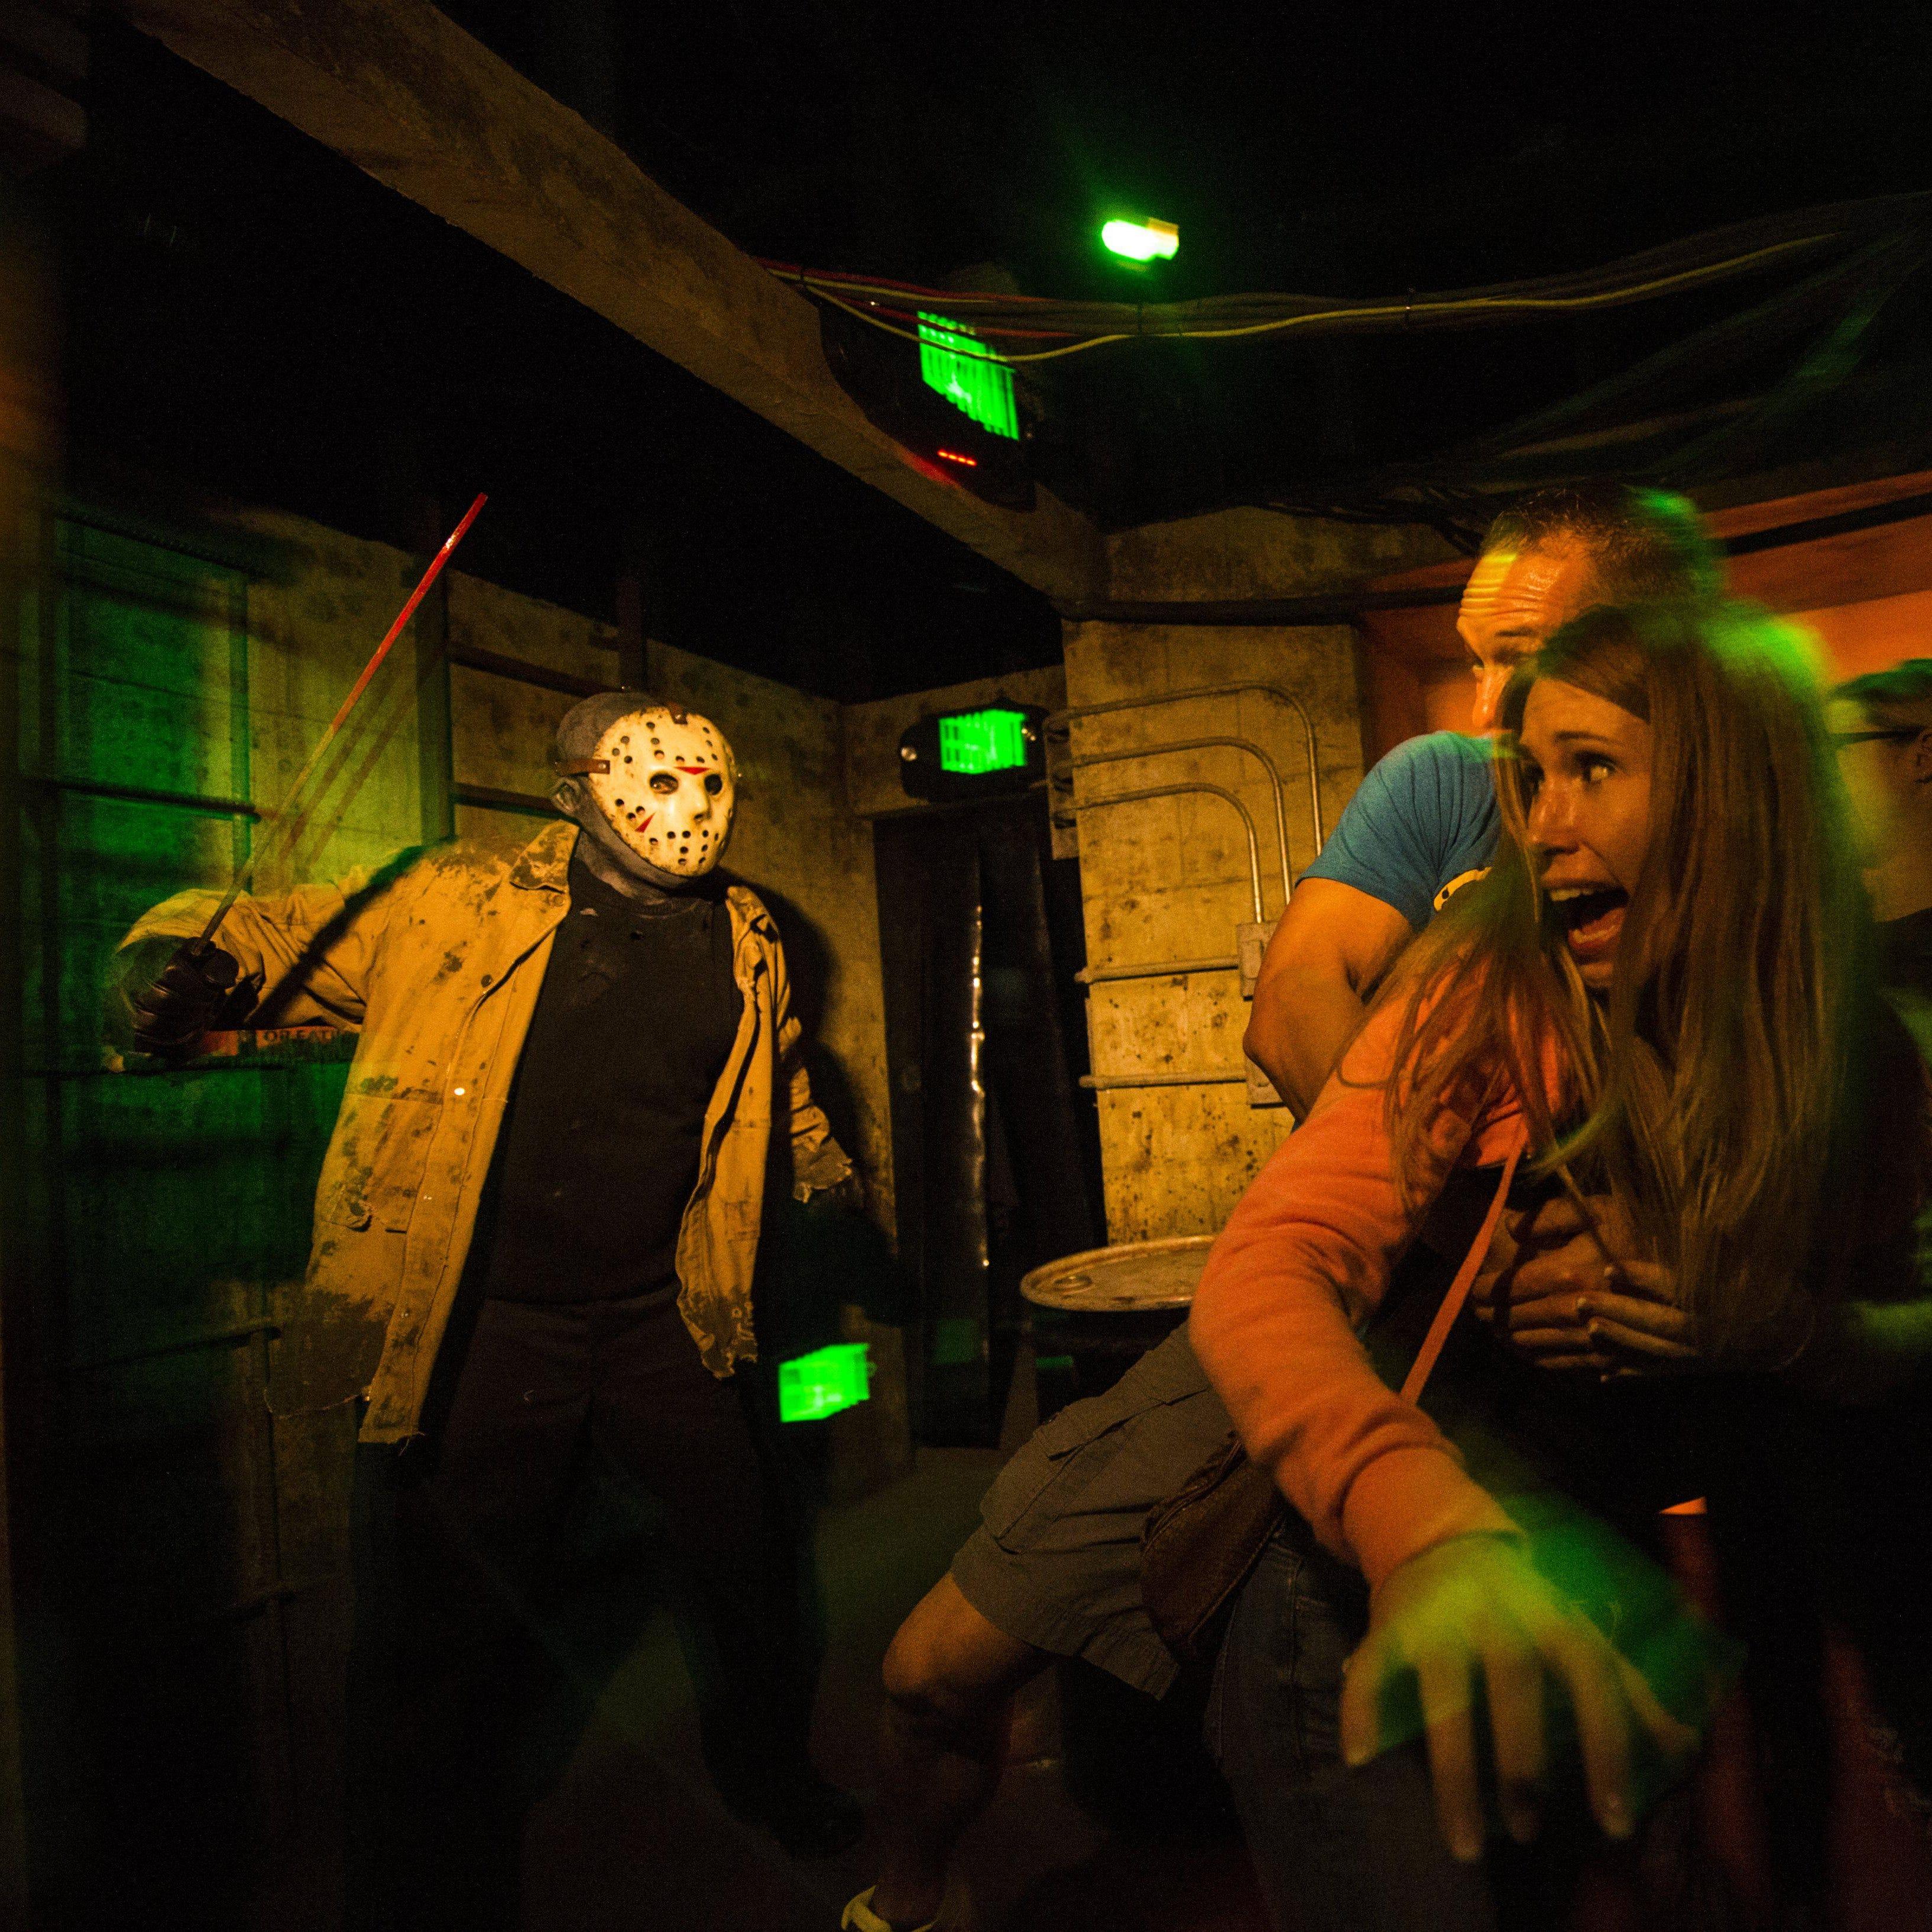 Jacksonville Nc Halloween Events 2020 Universal Orlando: Halloween Horror Nights canceled for 2020